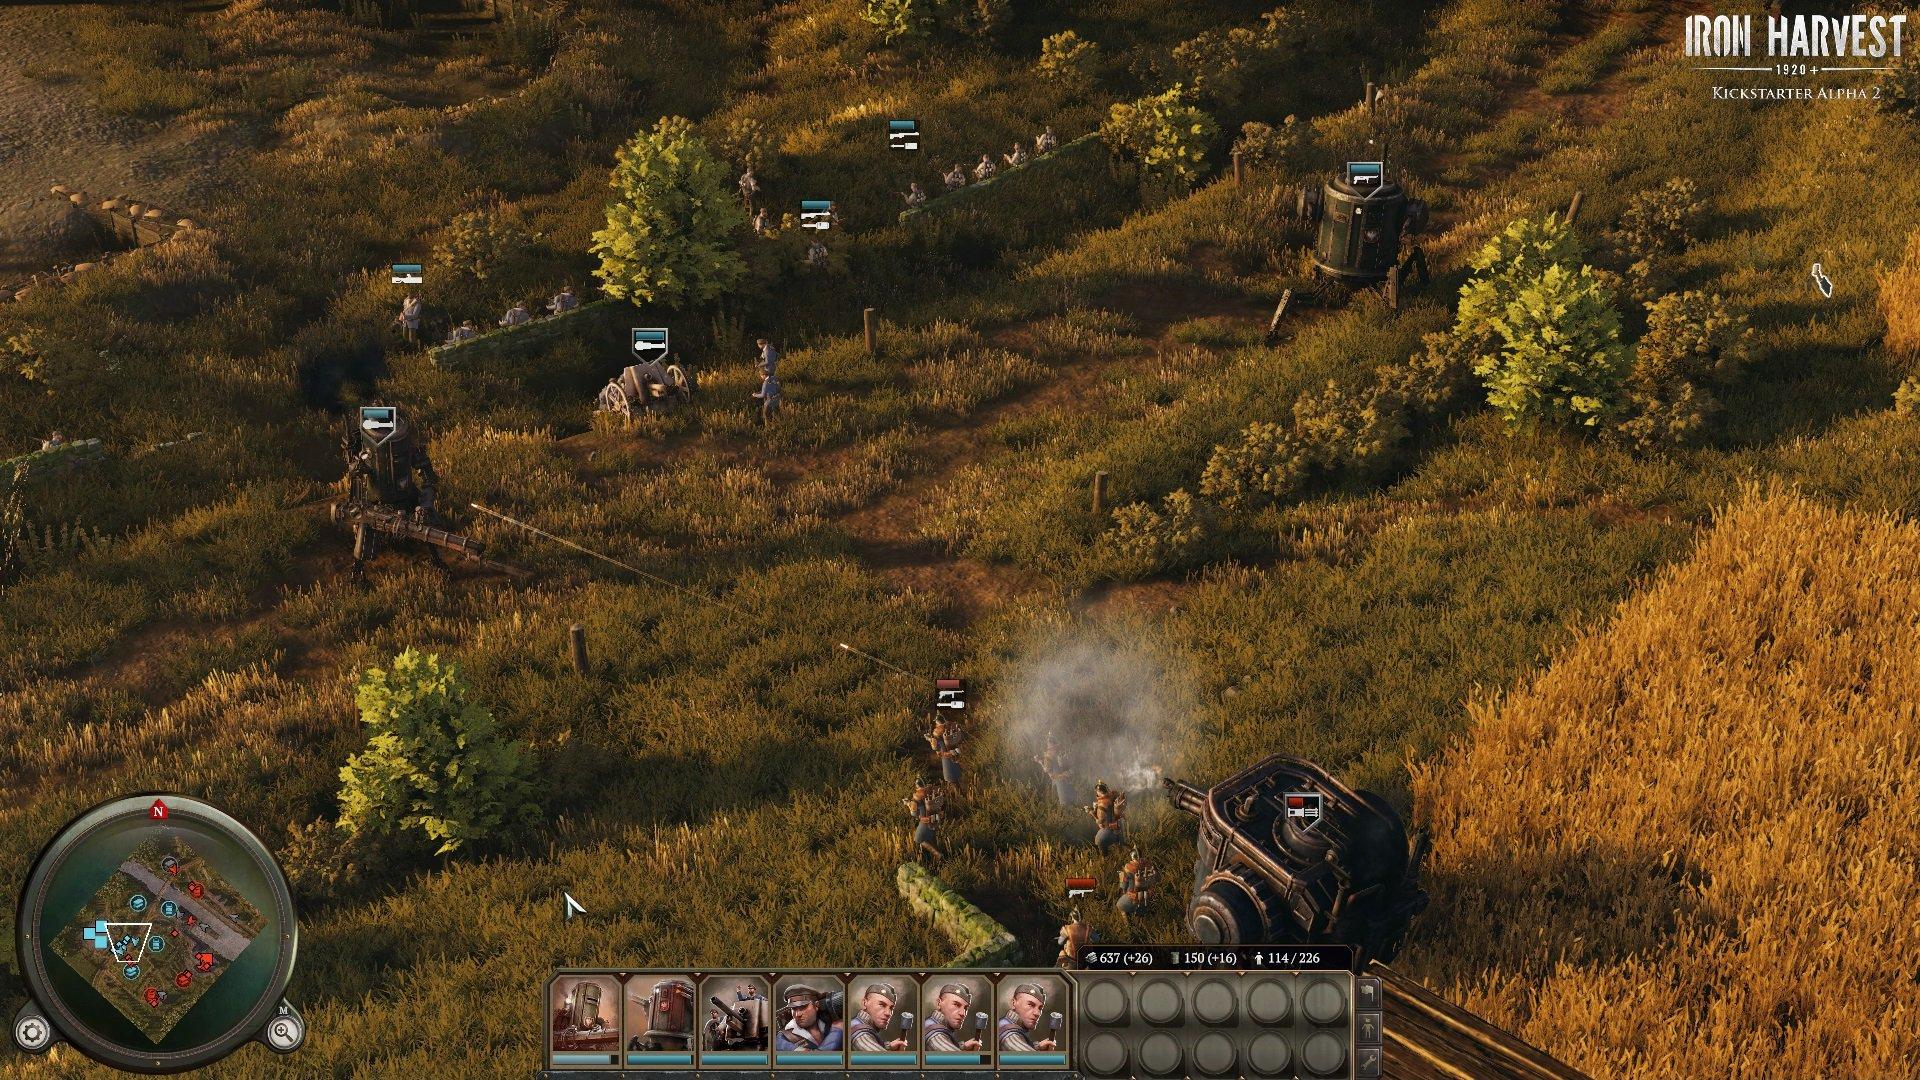 Iron Havers Gamescom